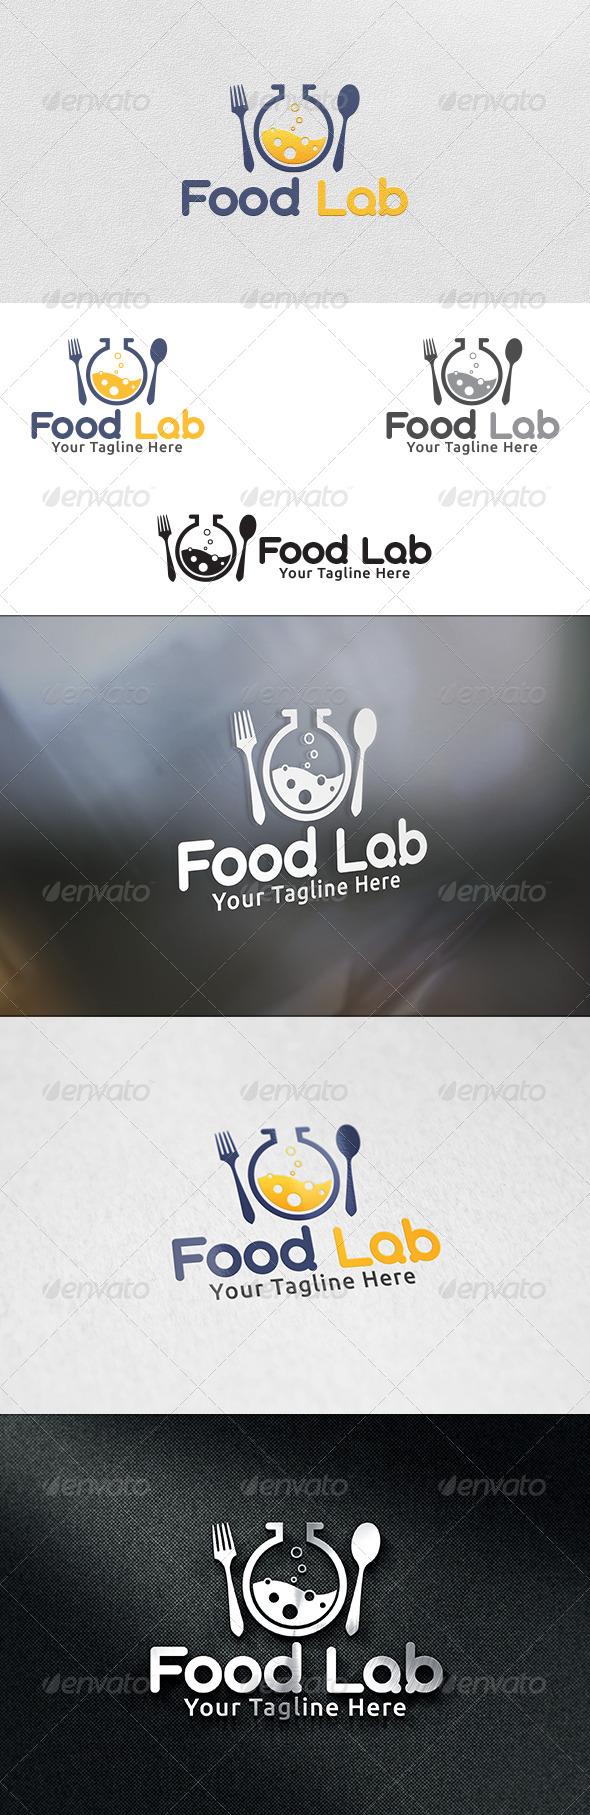 GraphicRiver Food Lab Logo Template 6219362